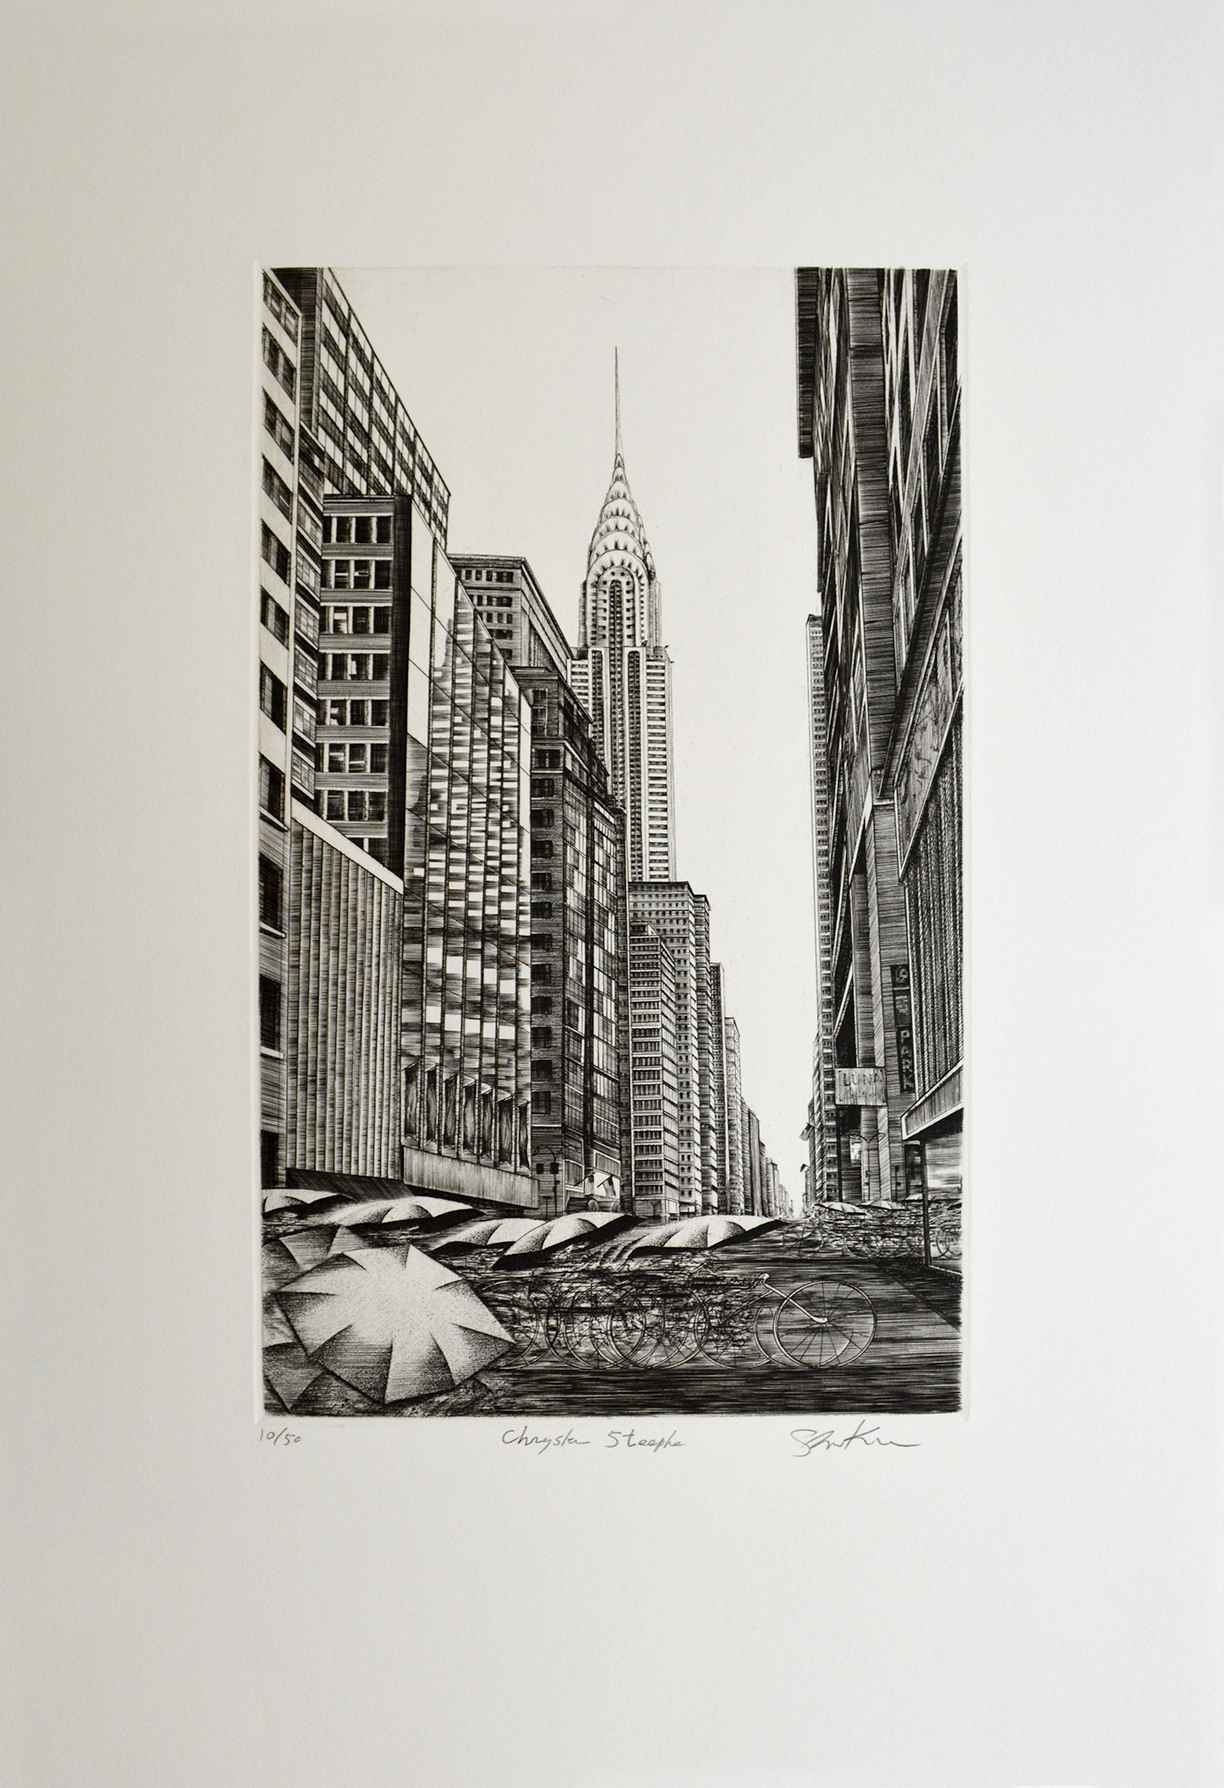 Chrysler Steeple by  Shigeki Kuroda - Masterpiece Online